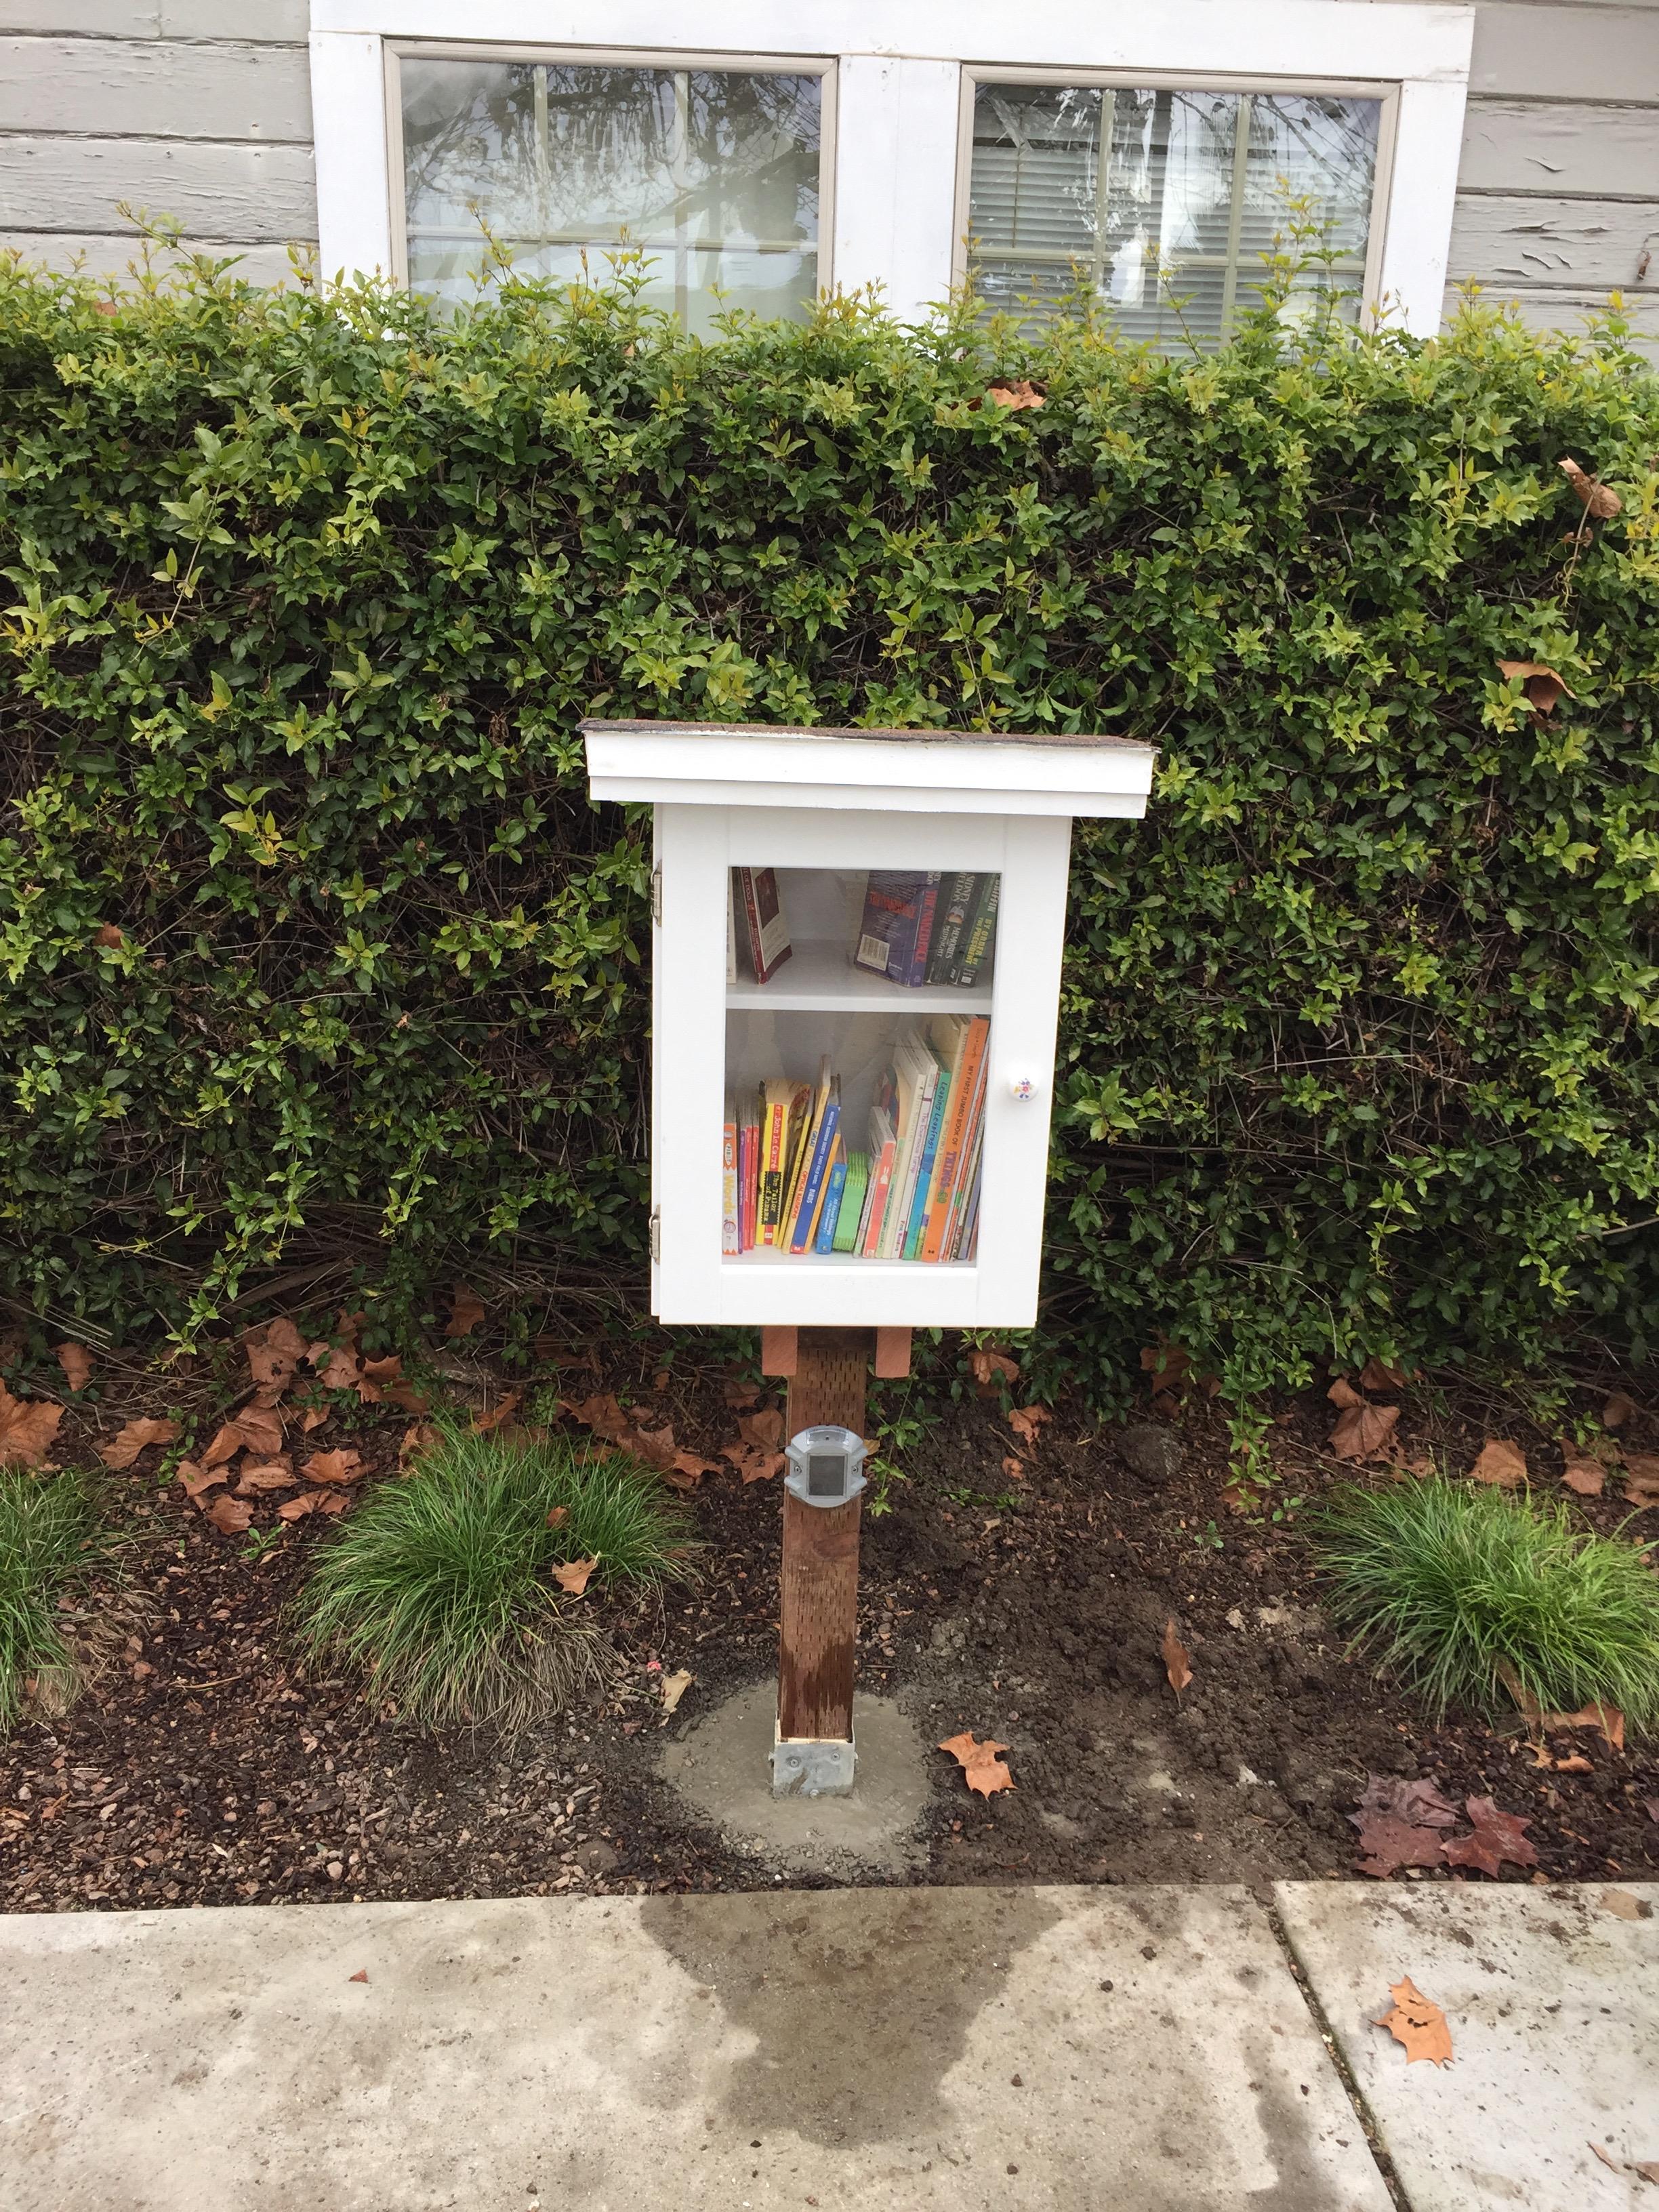 Buena Vista Park Little Free Library